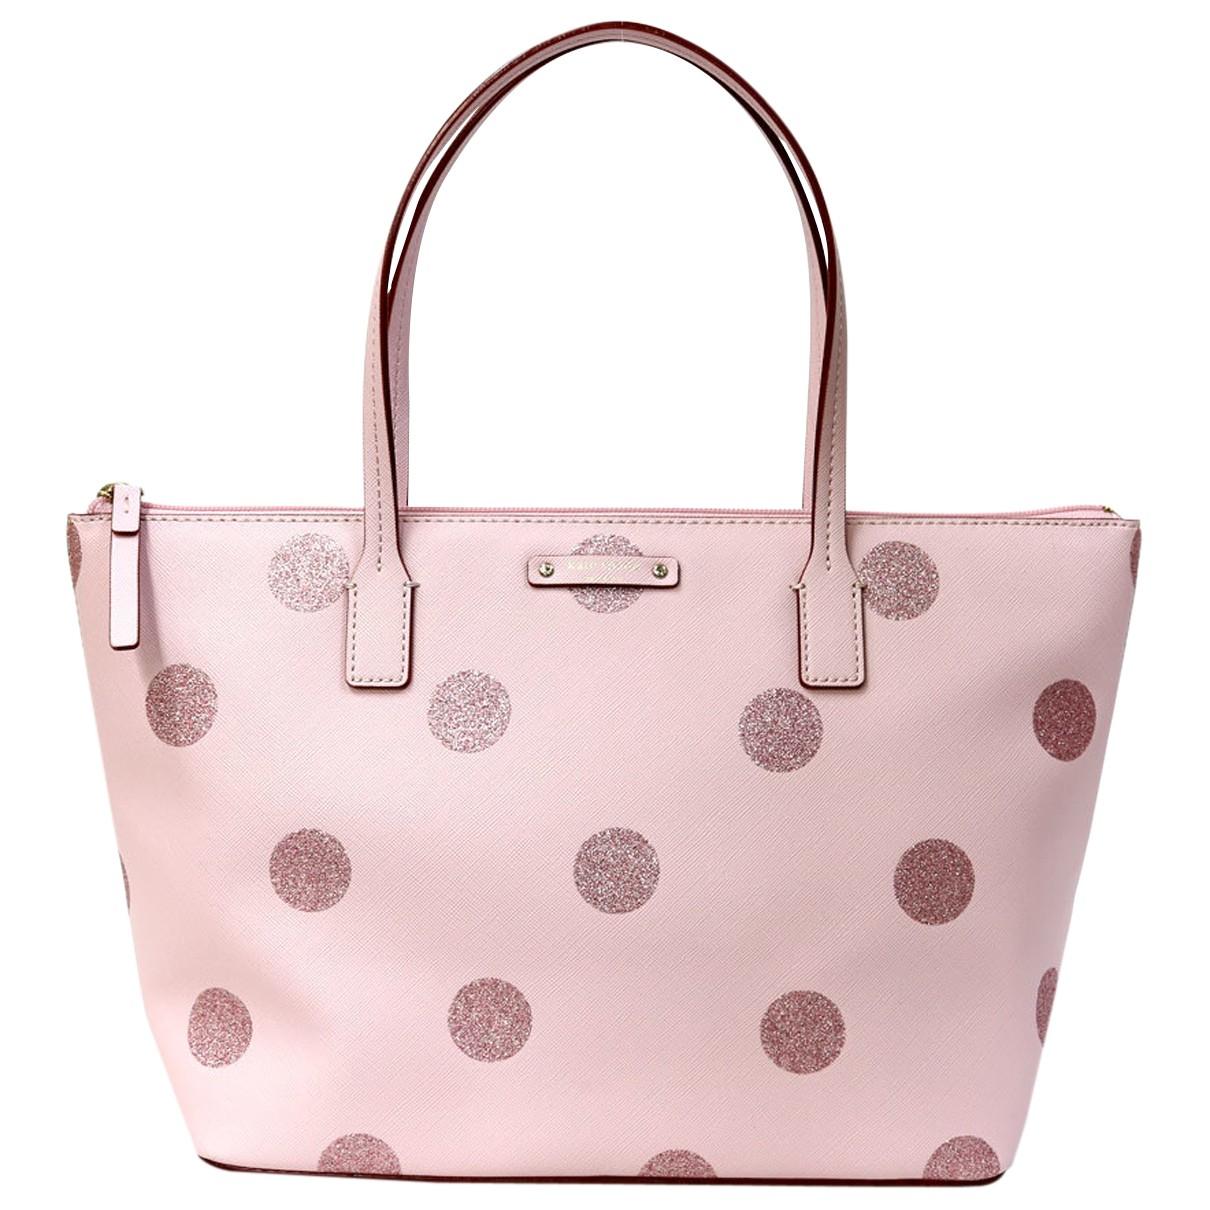 Kate Spade N Pink Leather bag for Men N